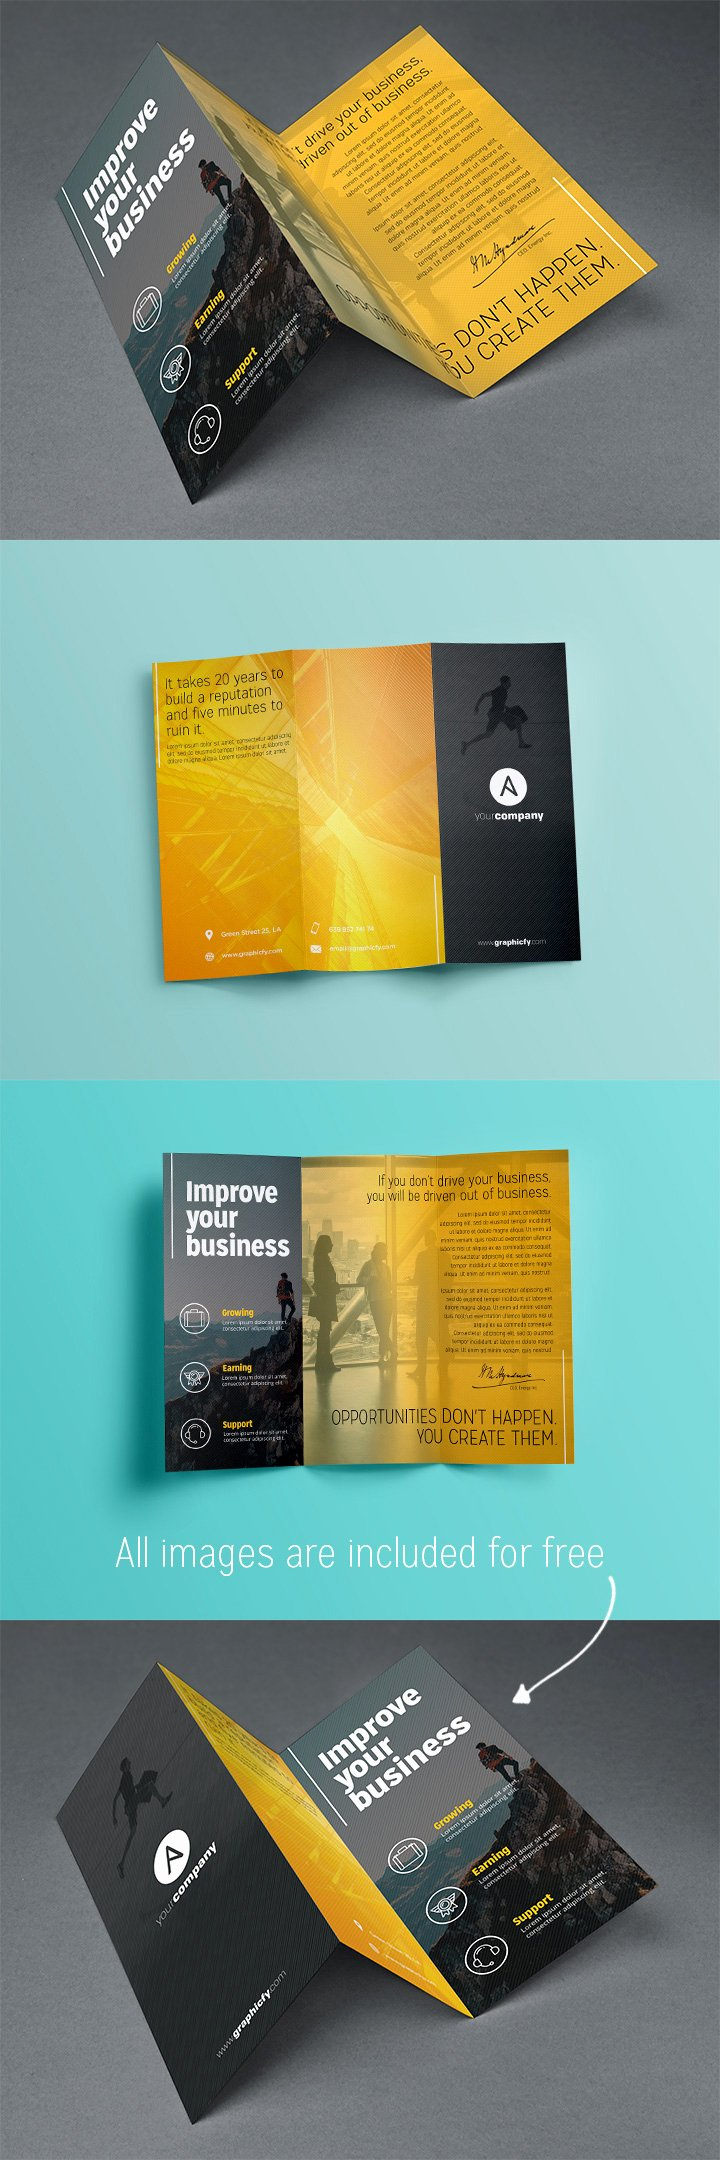 Tri Fold Brochure Template Psd Elegant Tri Fold Brochure Template Psd Brochure Templates Graphicfy